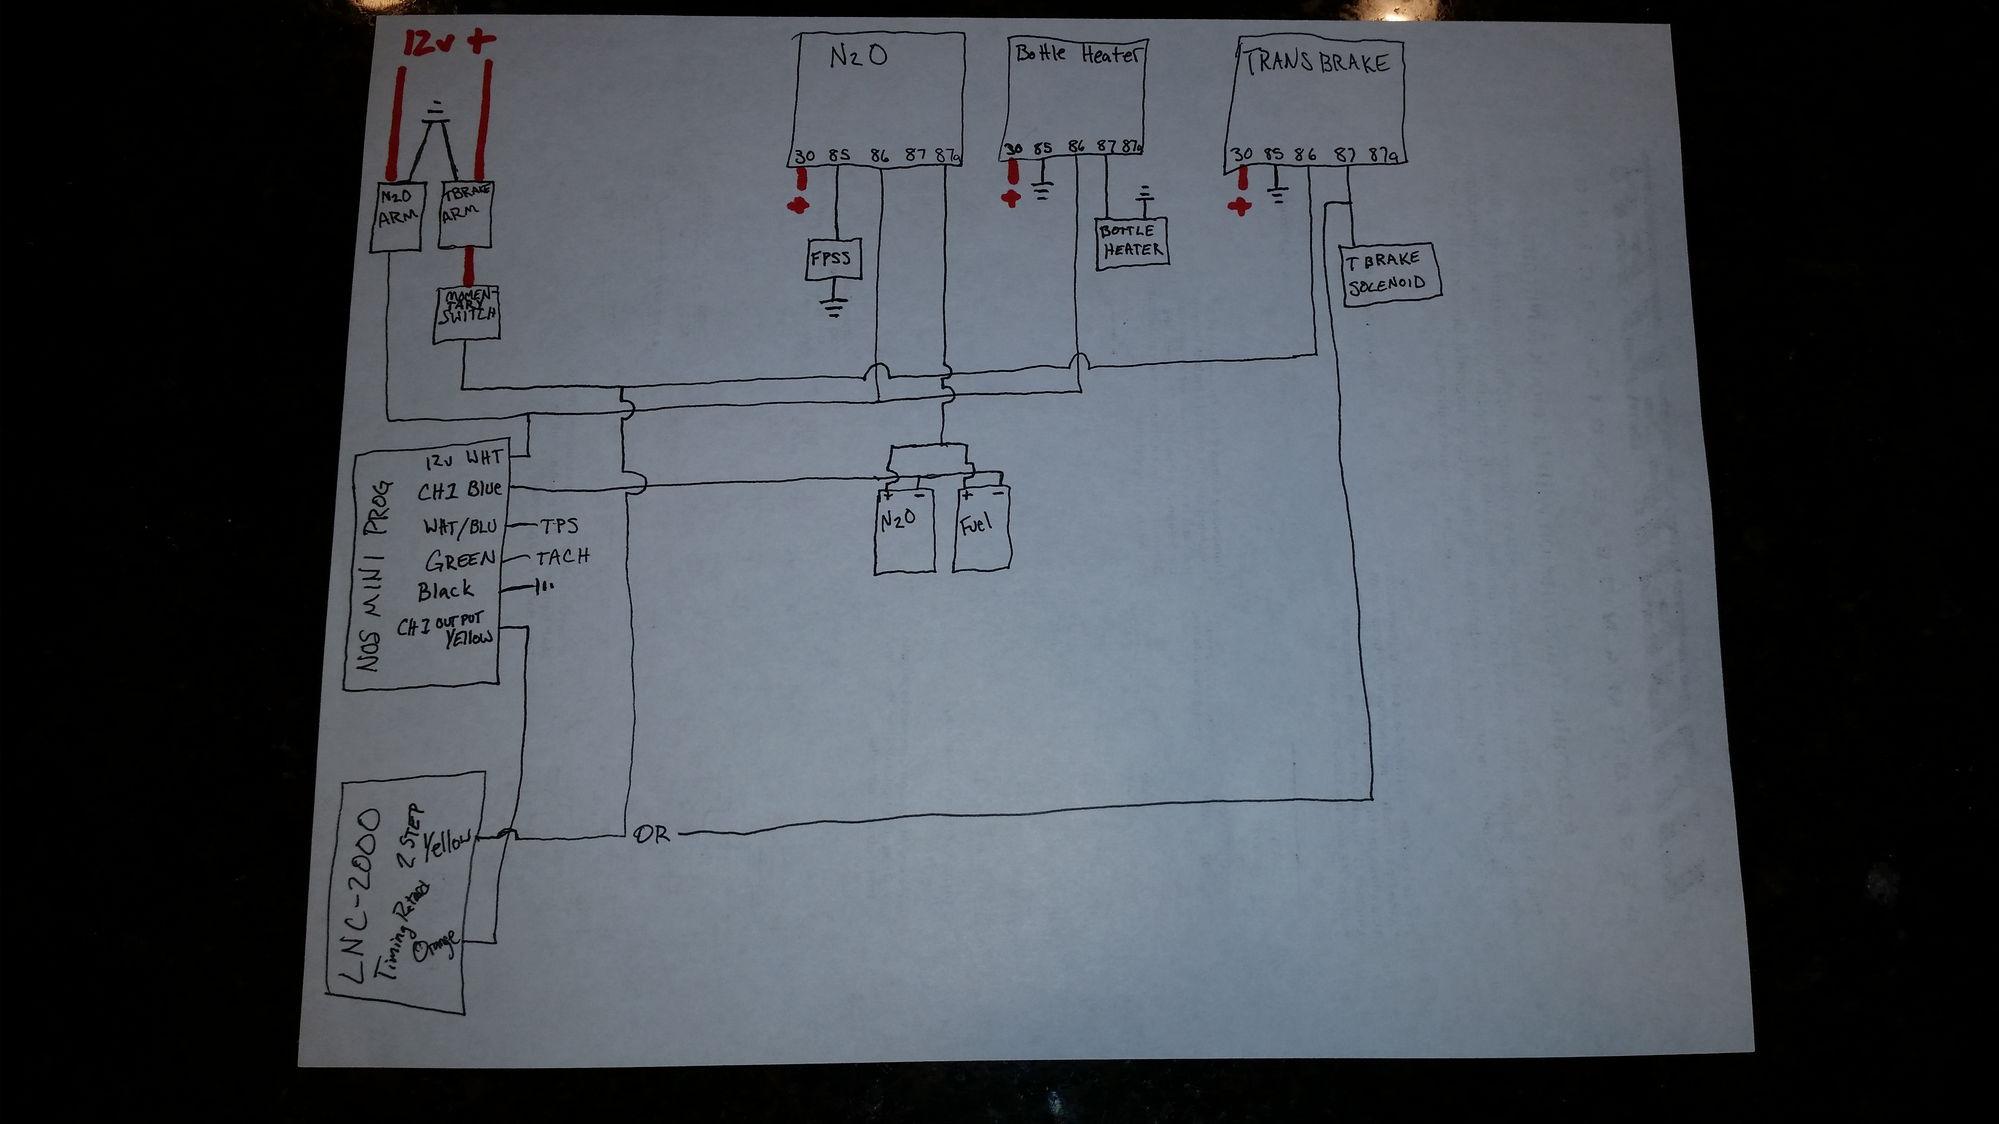 nitrous express proton wiring diagram rj11 wall jack